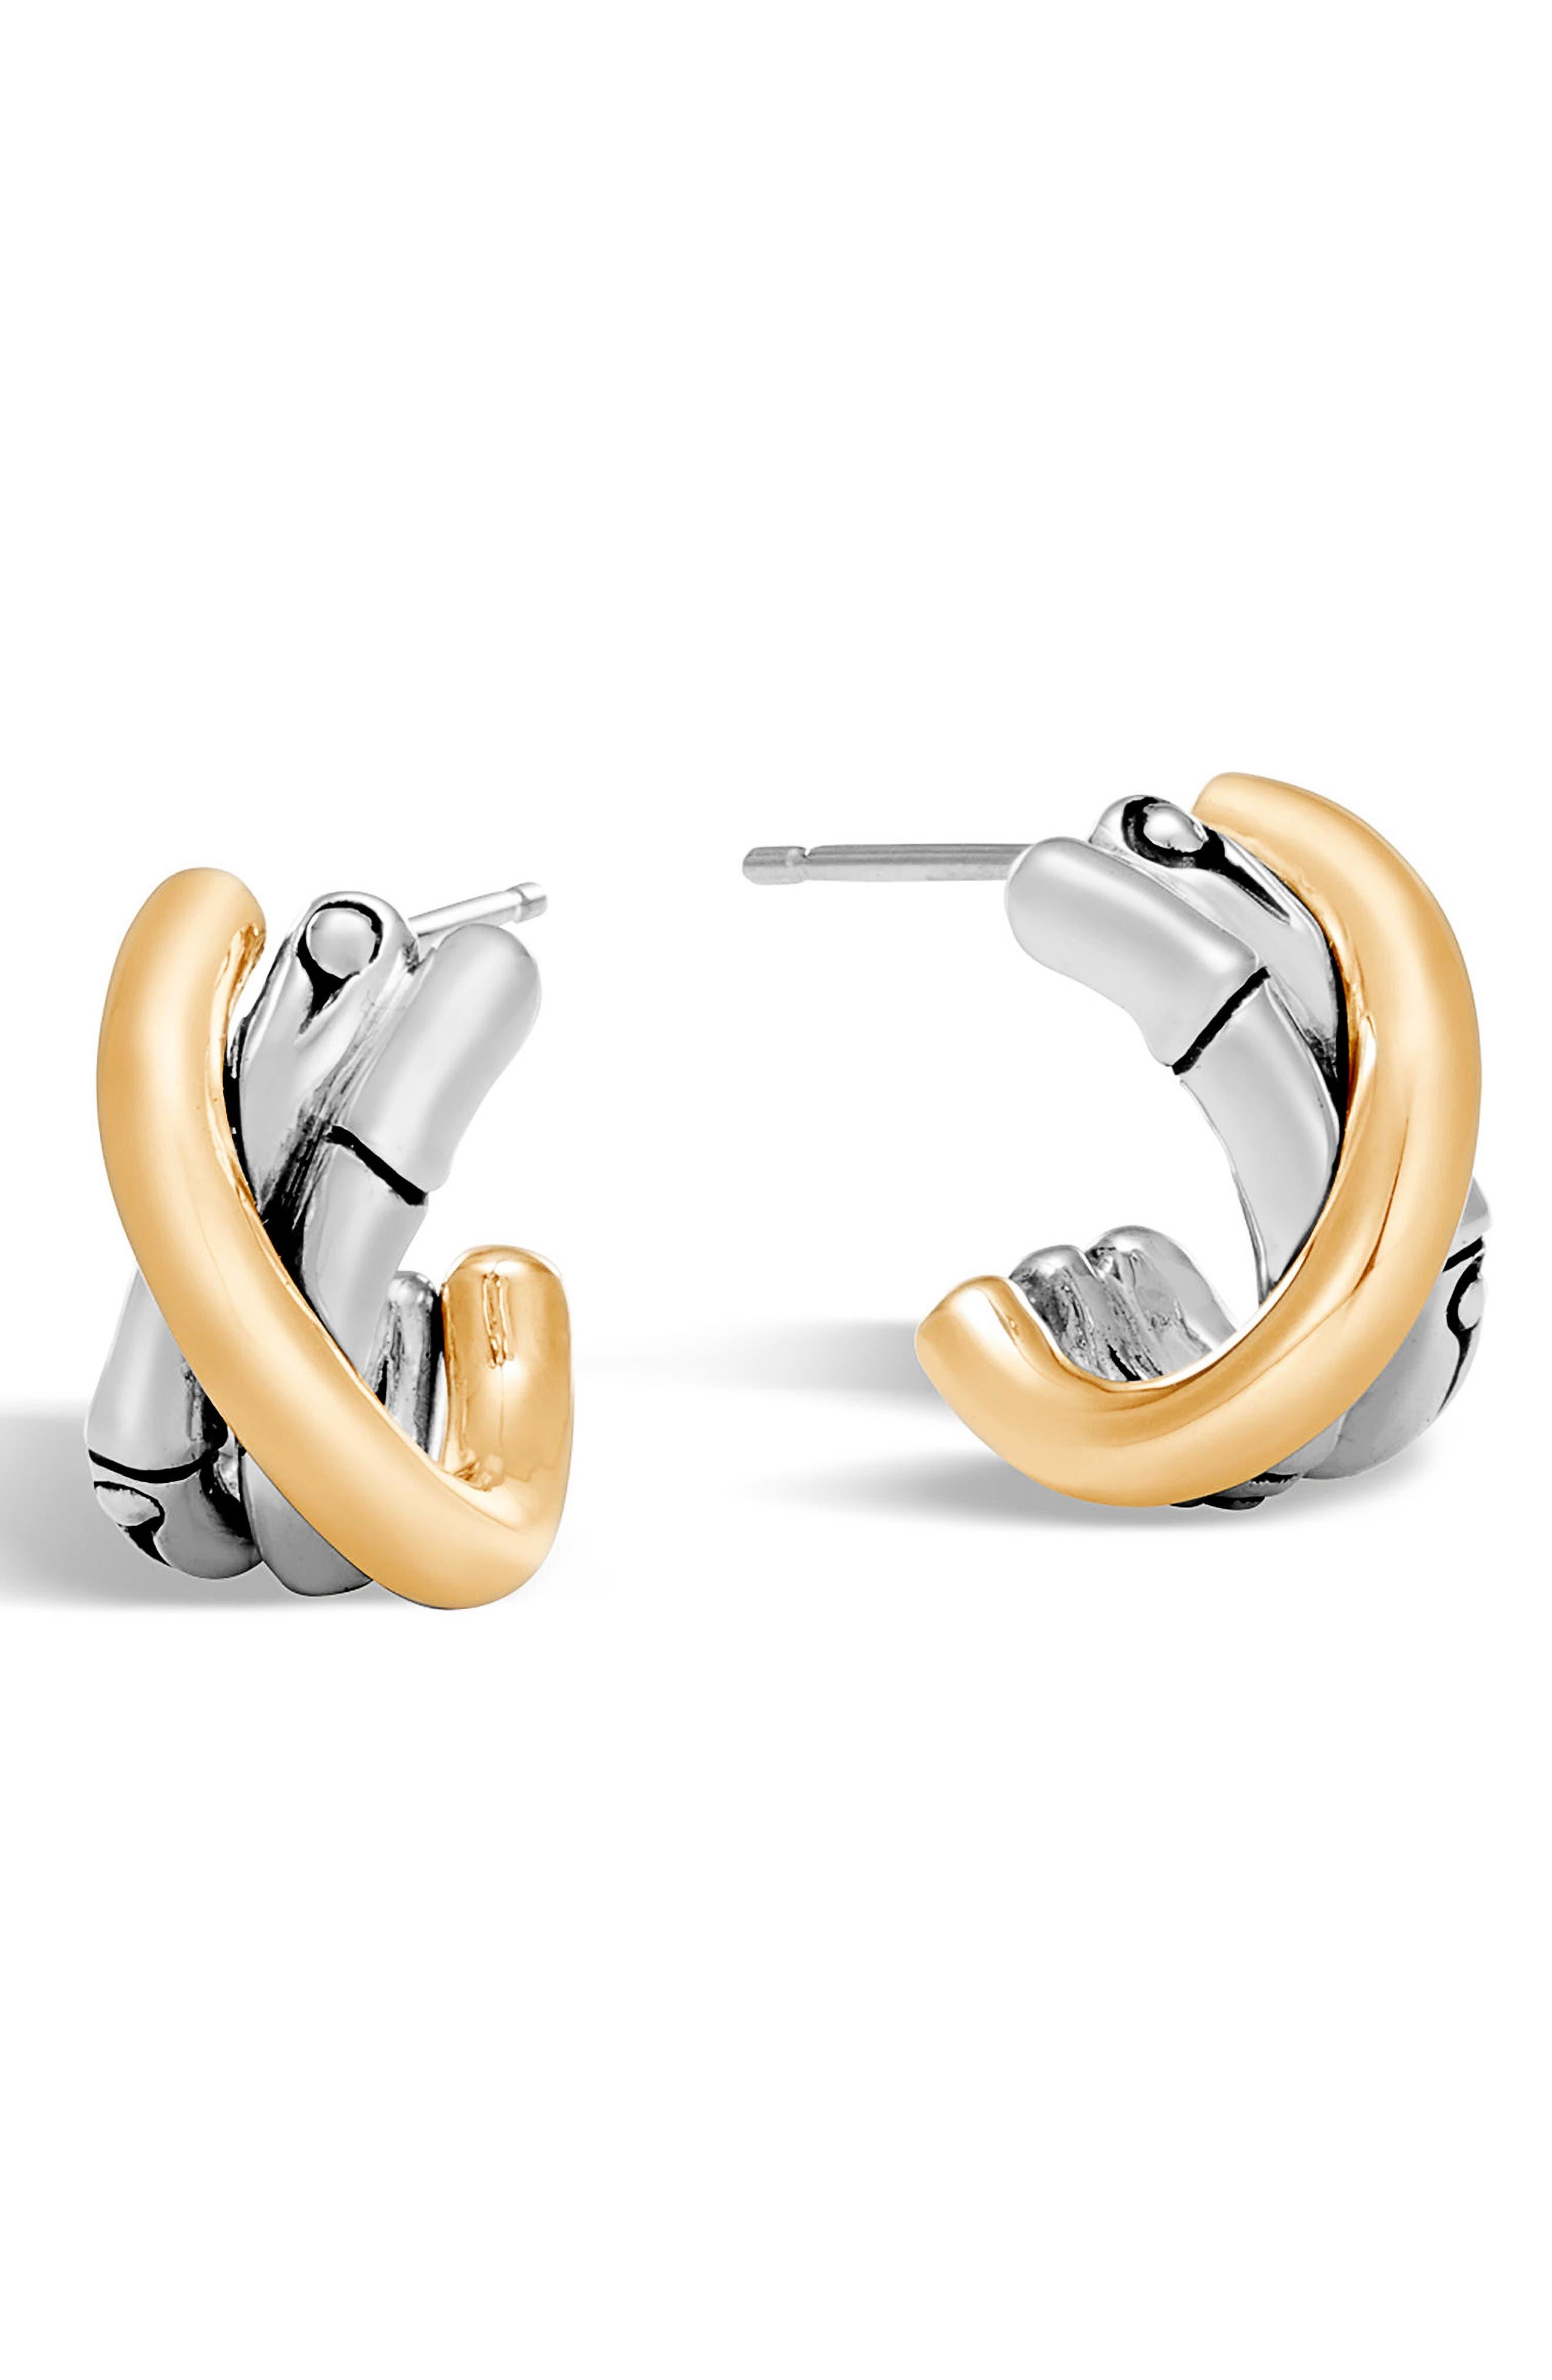 John Hardy Bamboo Stud Earrings